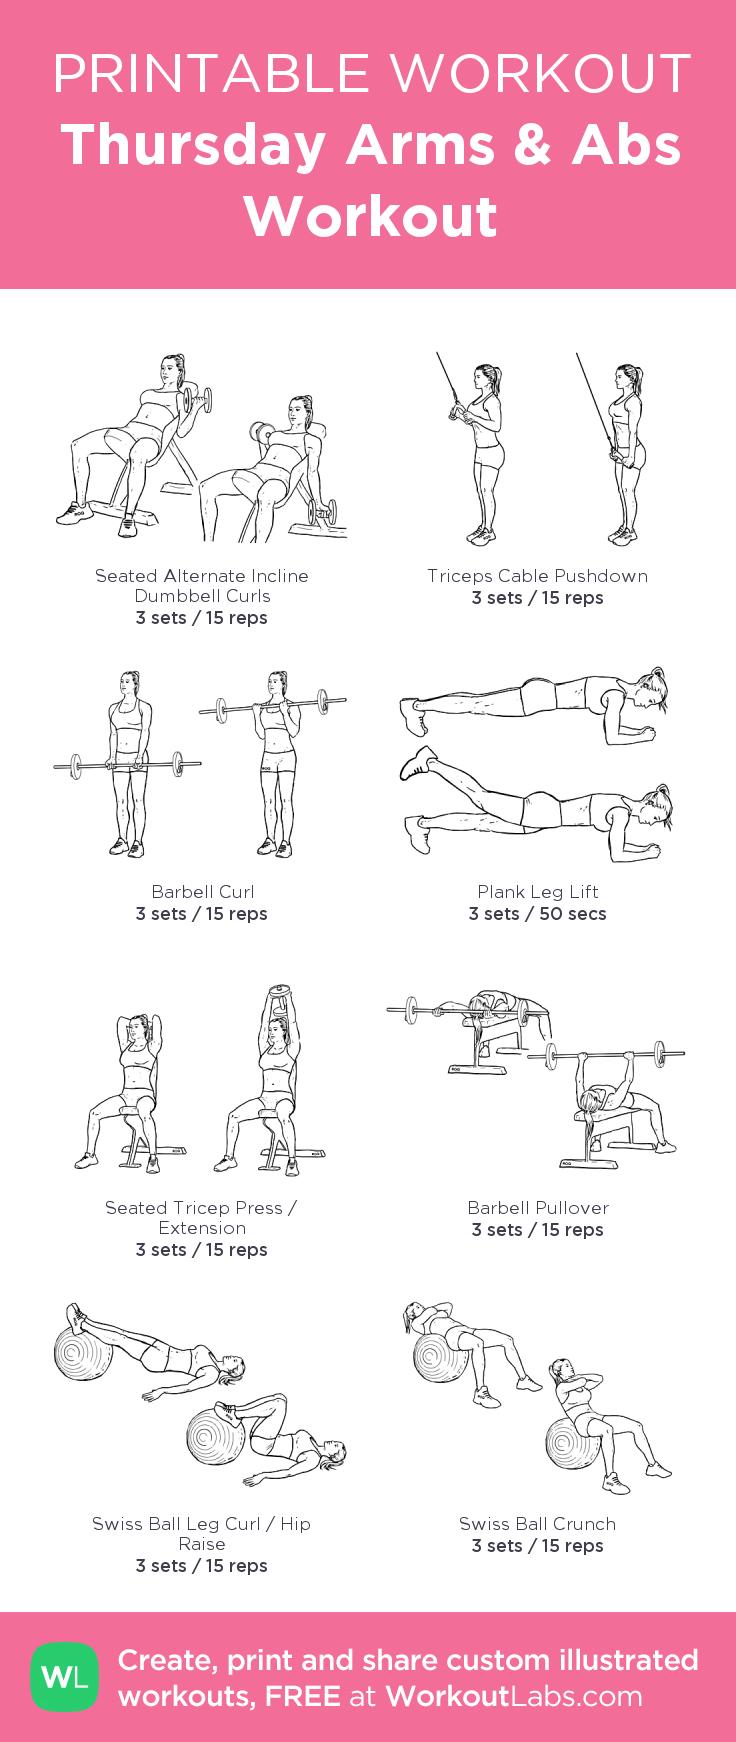 Thursday Arms Abs Workout: My Custom Printable Workout - Free Printable Gym Workout Routines